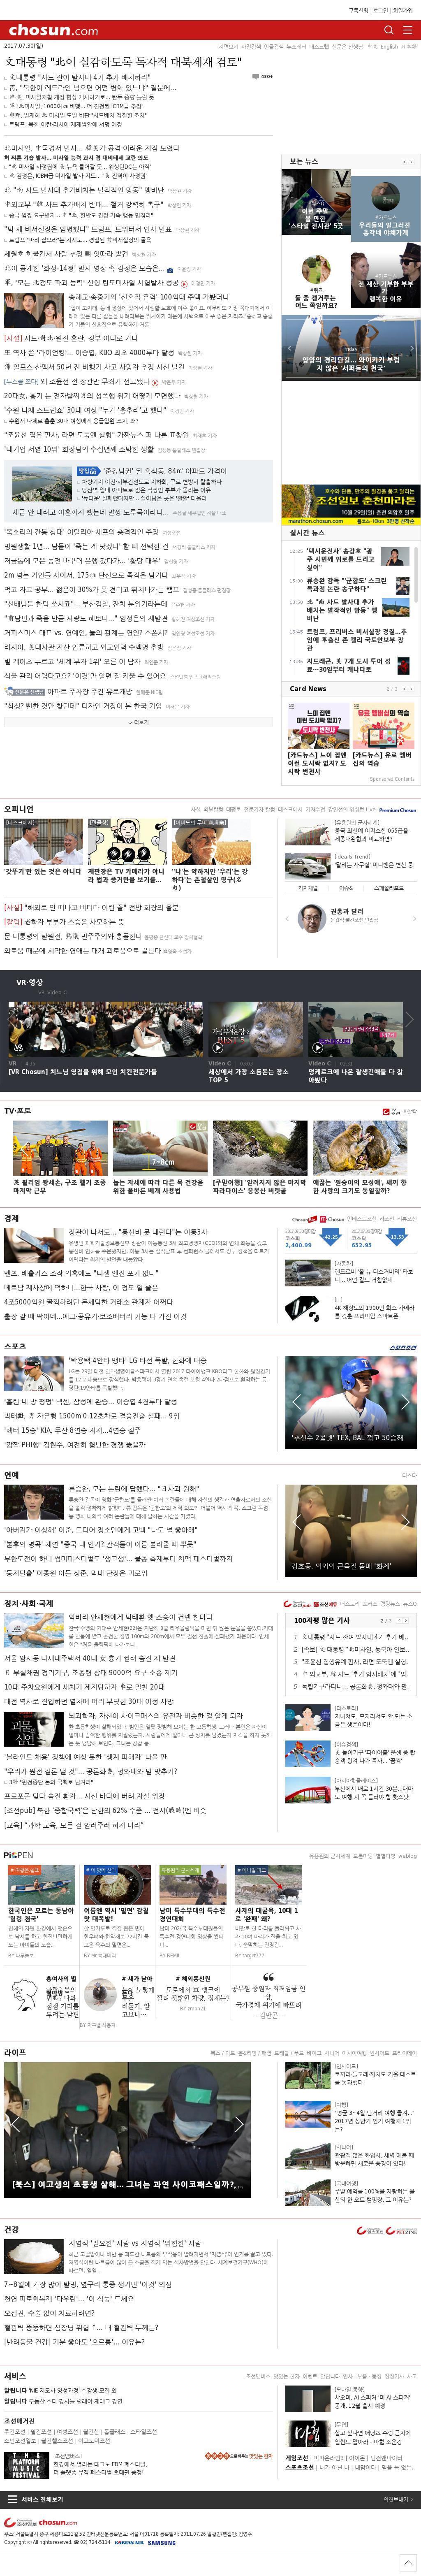 chosun.com at Saturday July 29, 2017, 3:02 p.m. UTC